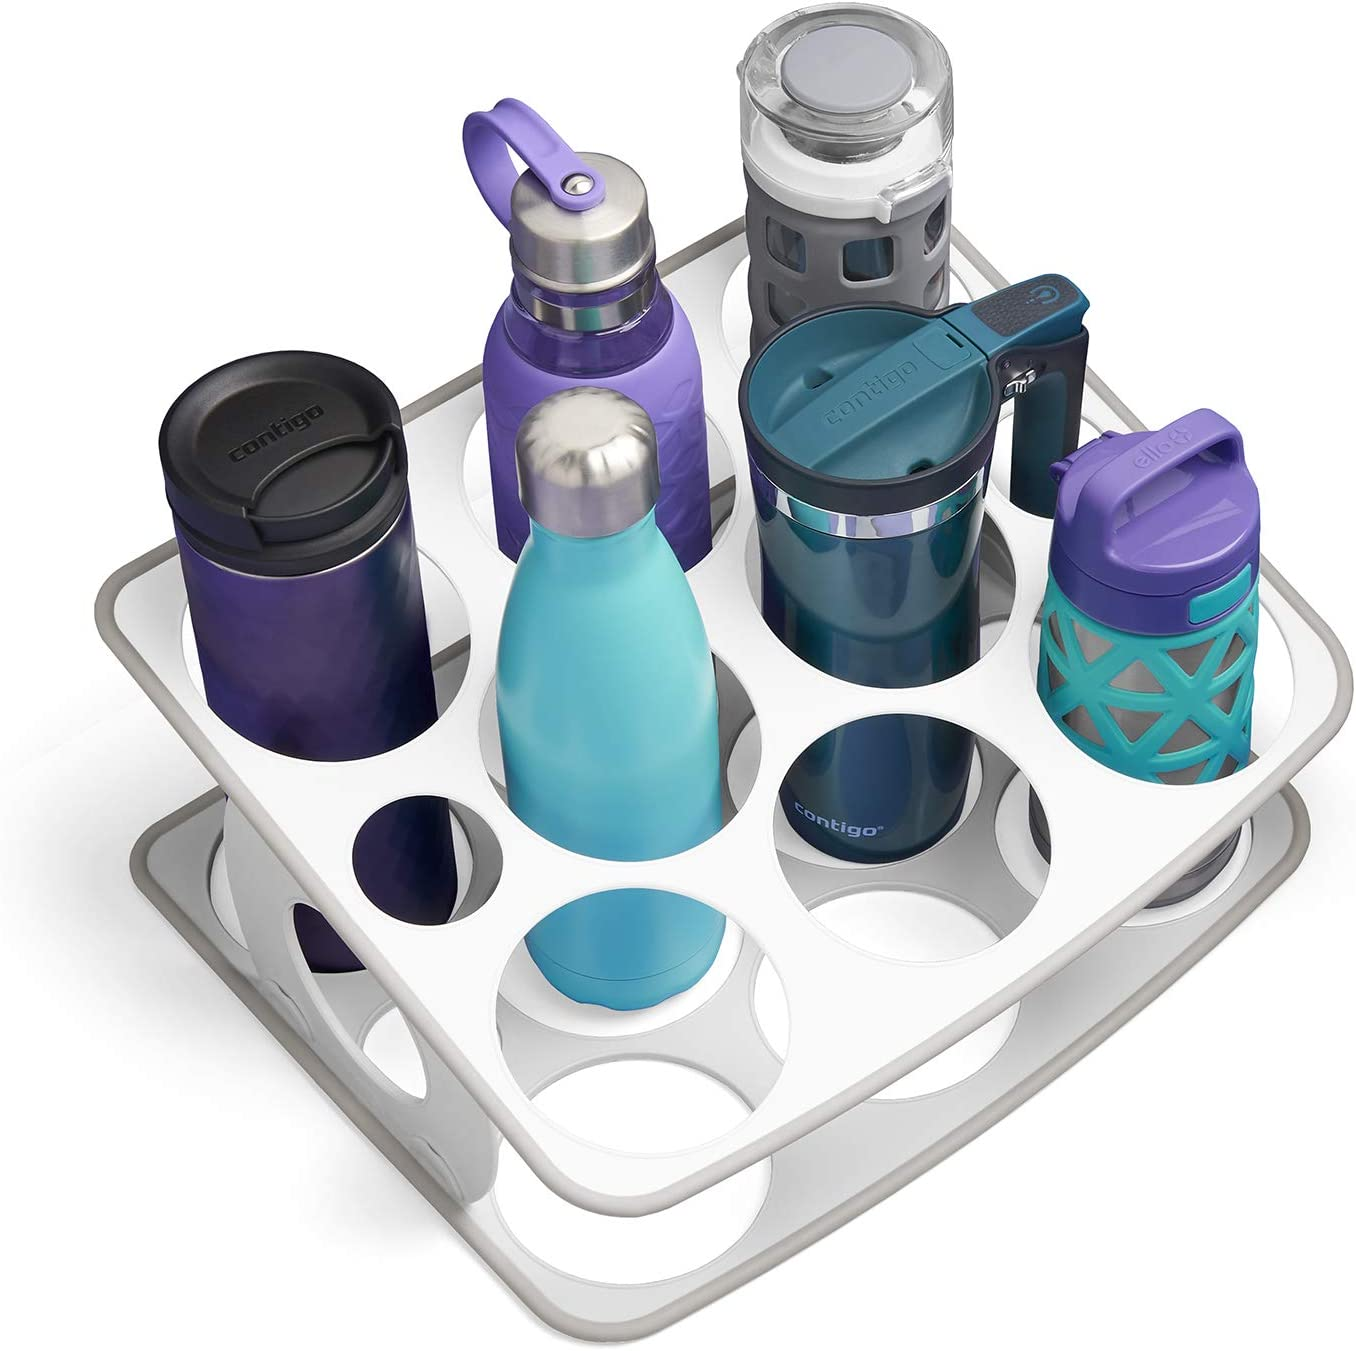 YouCopia BottleStand Travel Mug And Water Bottle, One Size, White